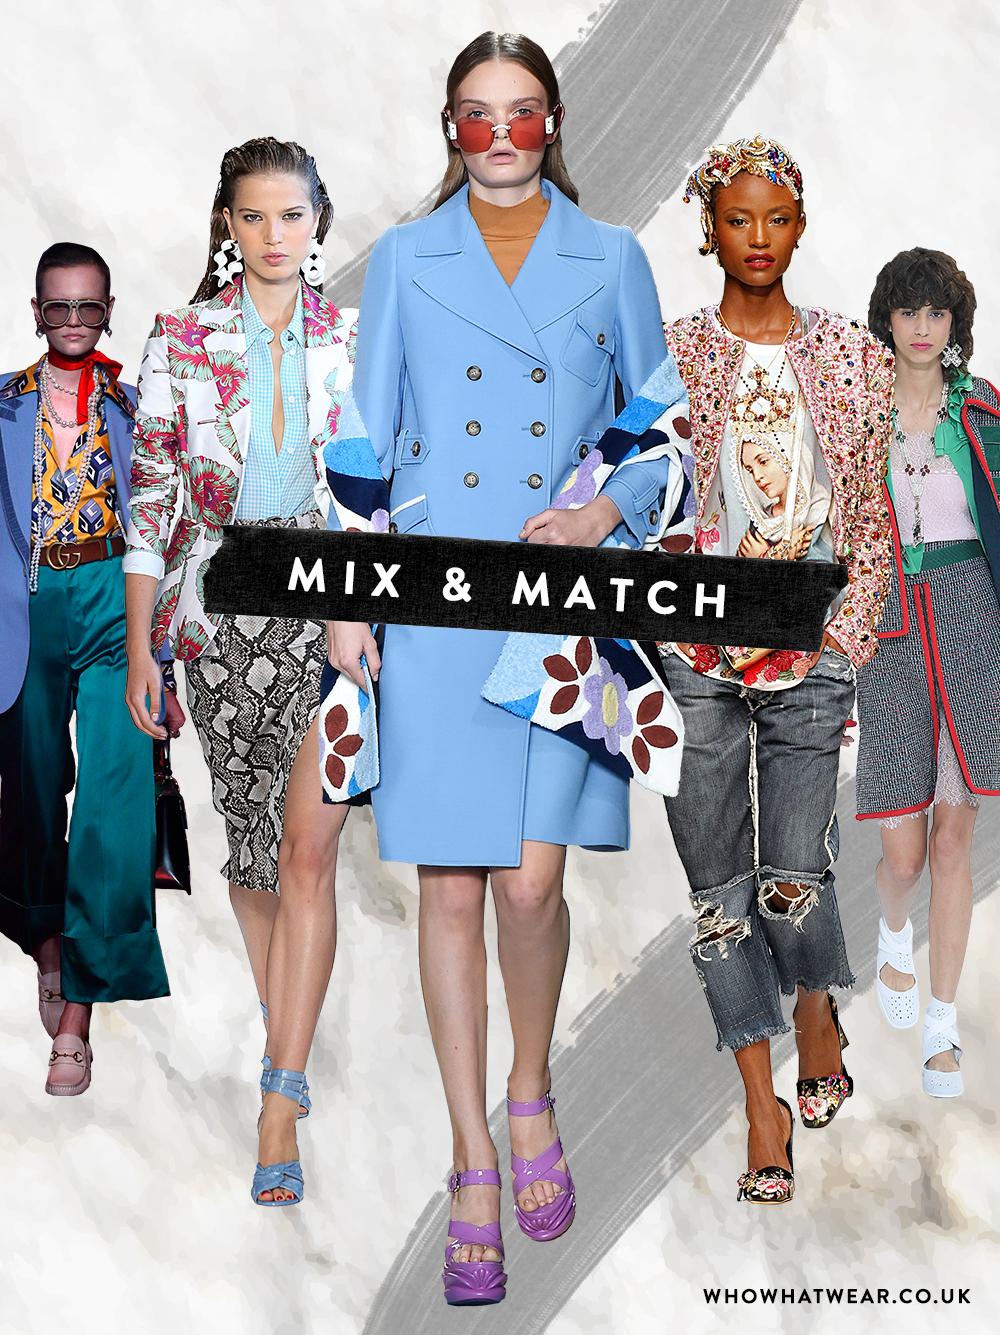 UK-Collage-Mix-&-Match.jpg